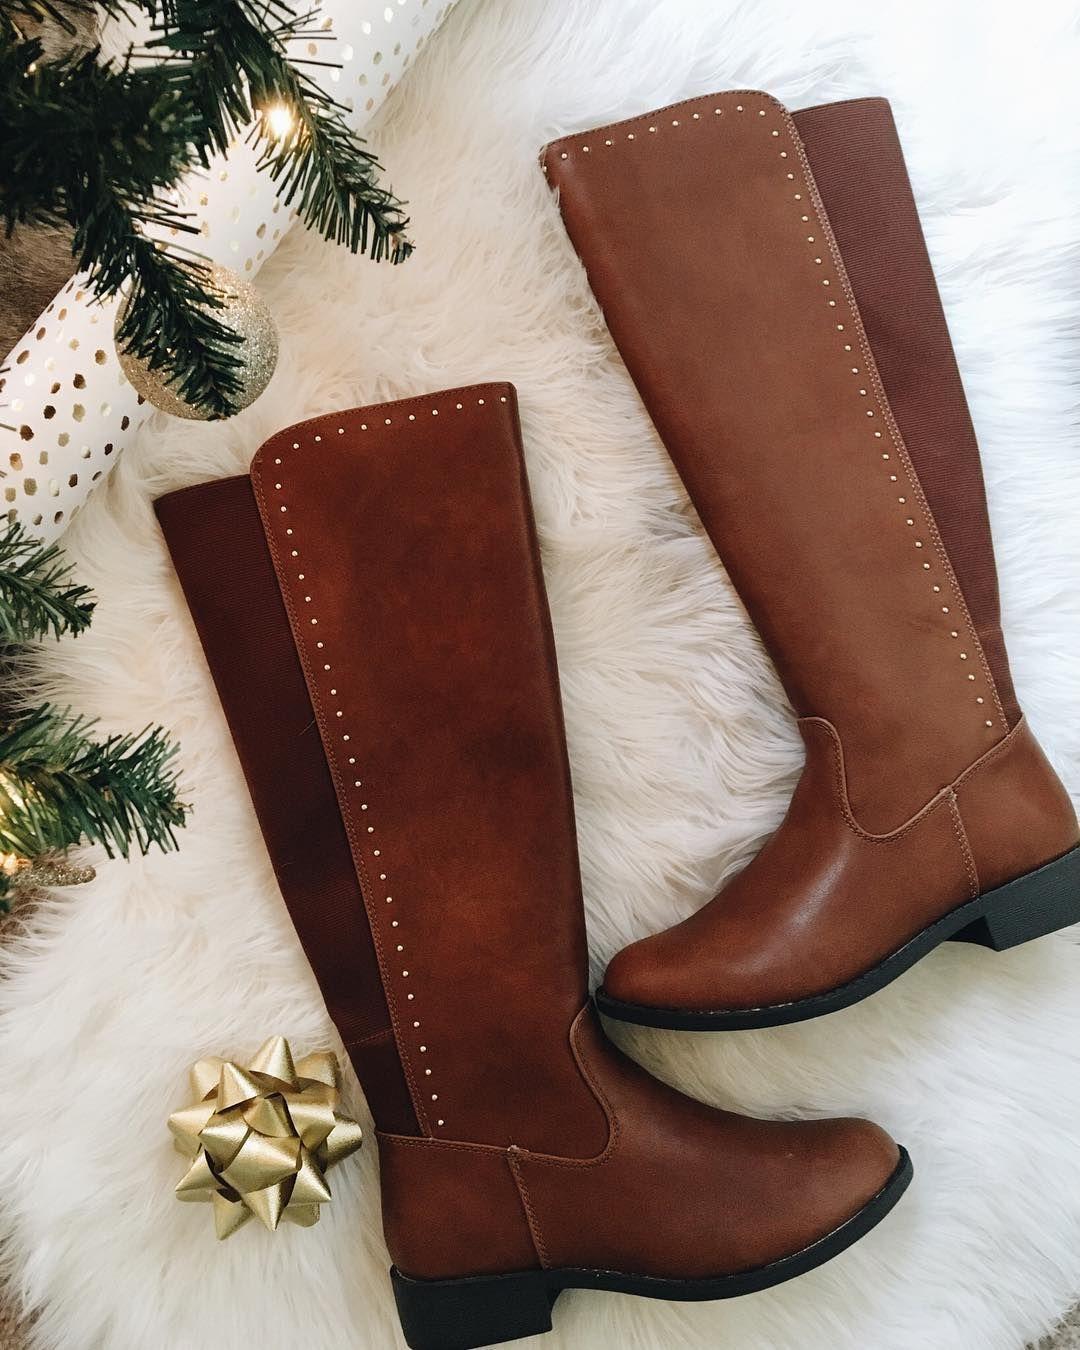 LC Lauren Conrad Devotion Knee-High Boots from Kohl s  d1013d62228